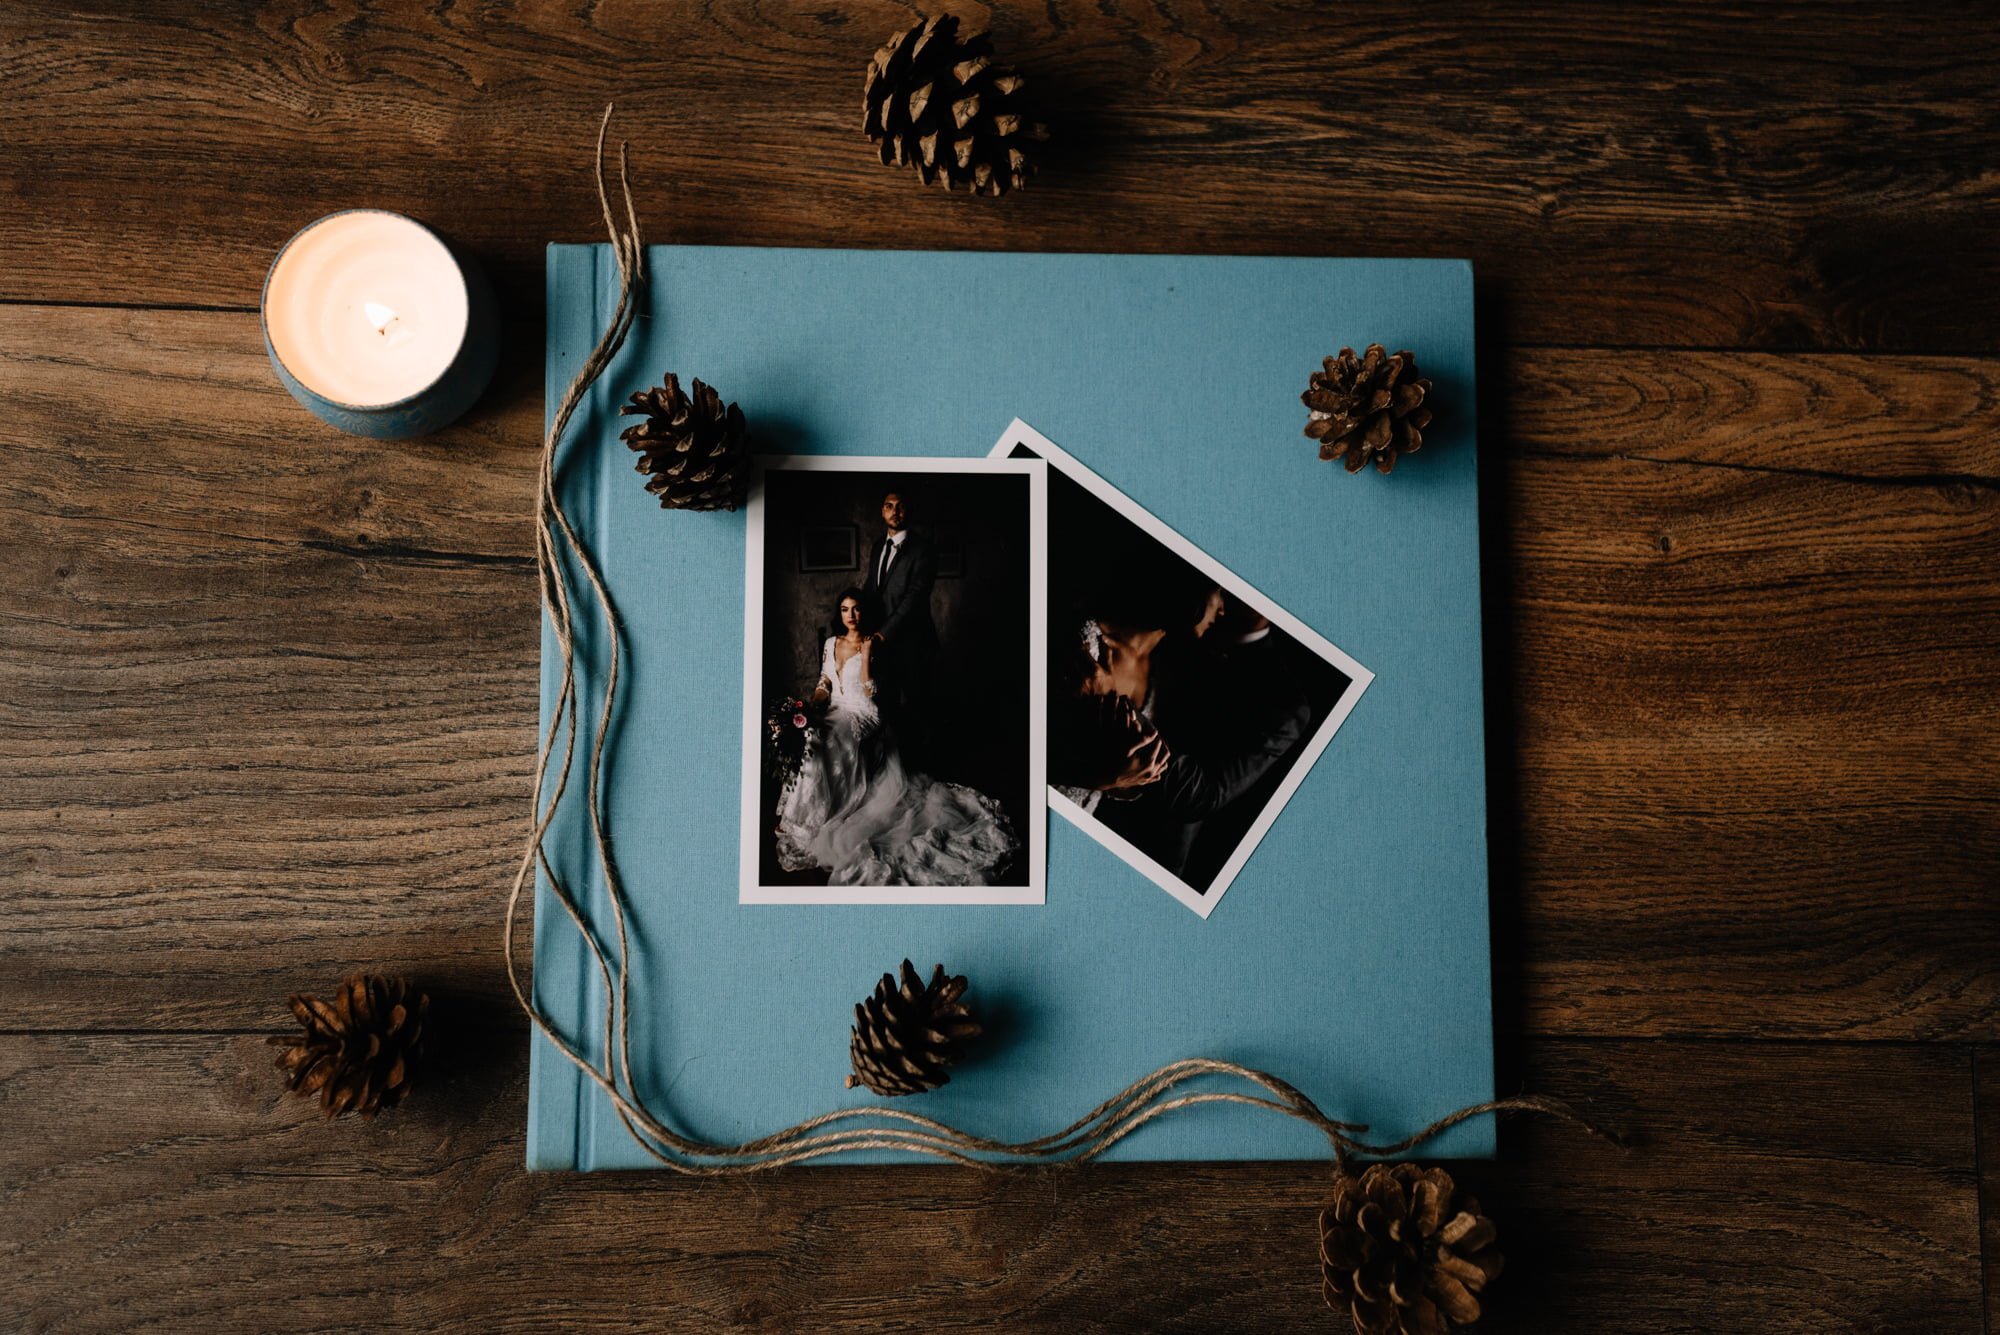 kashmir wedding album